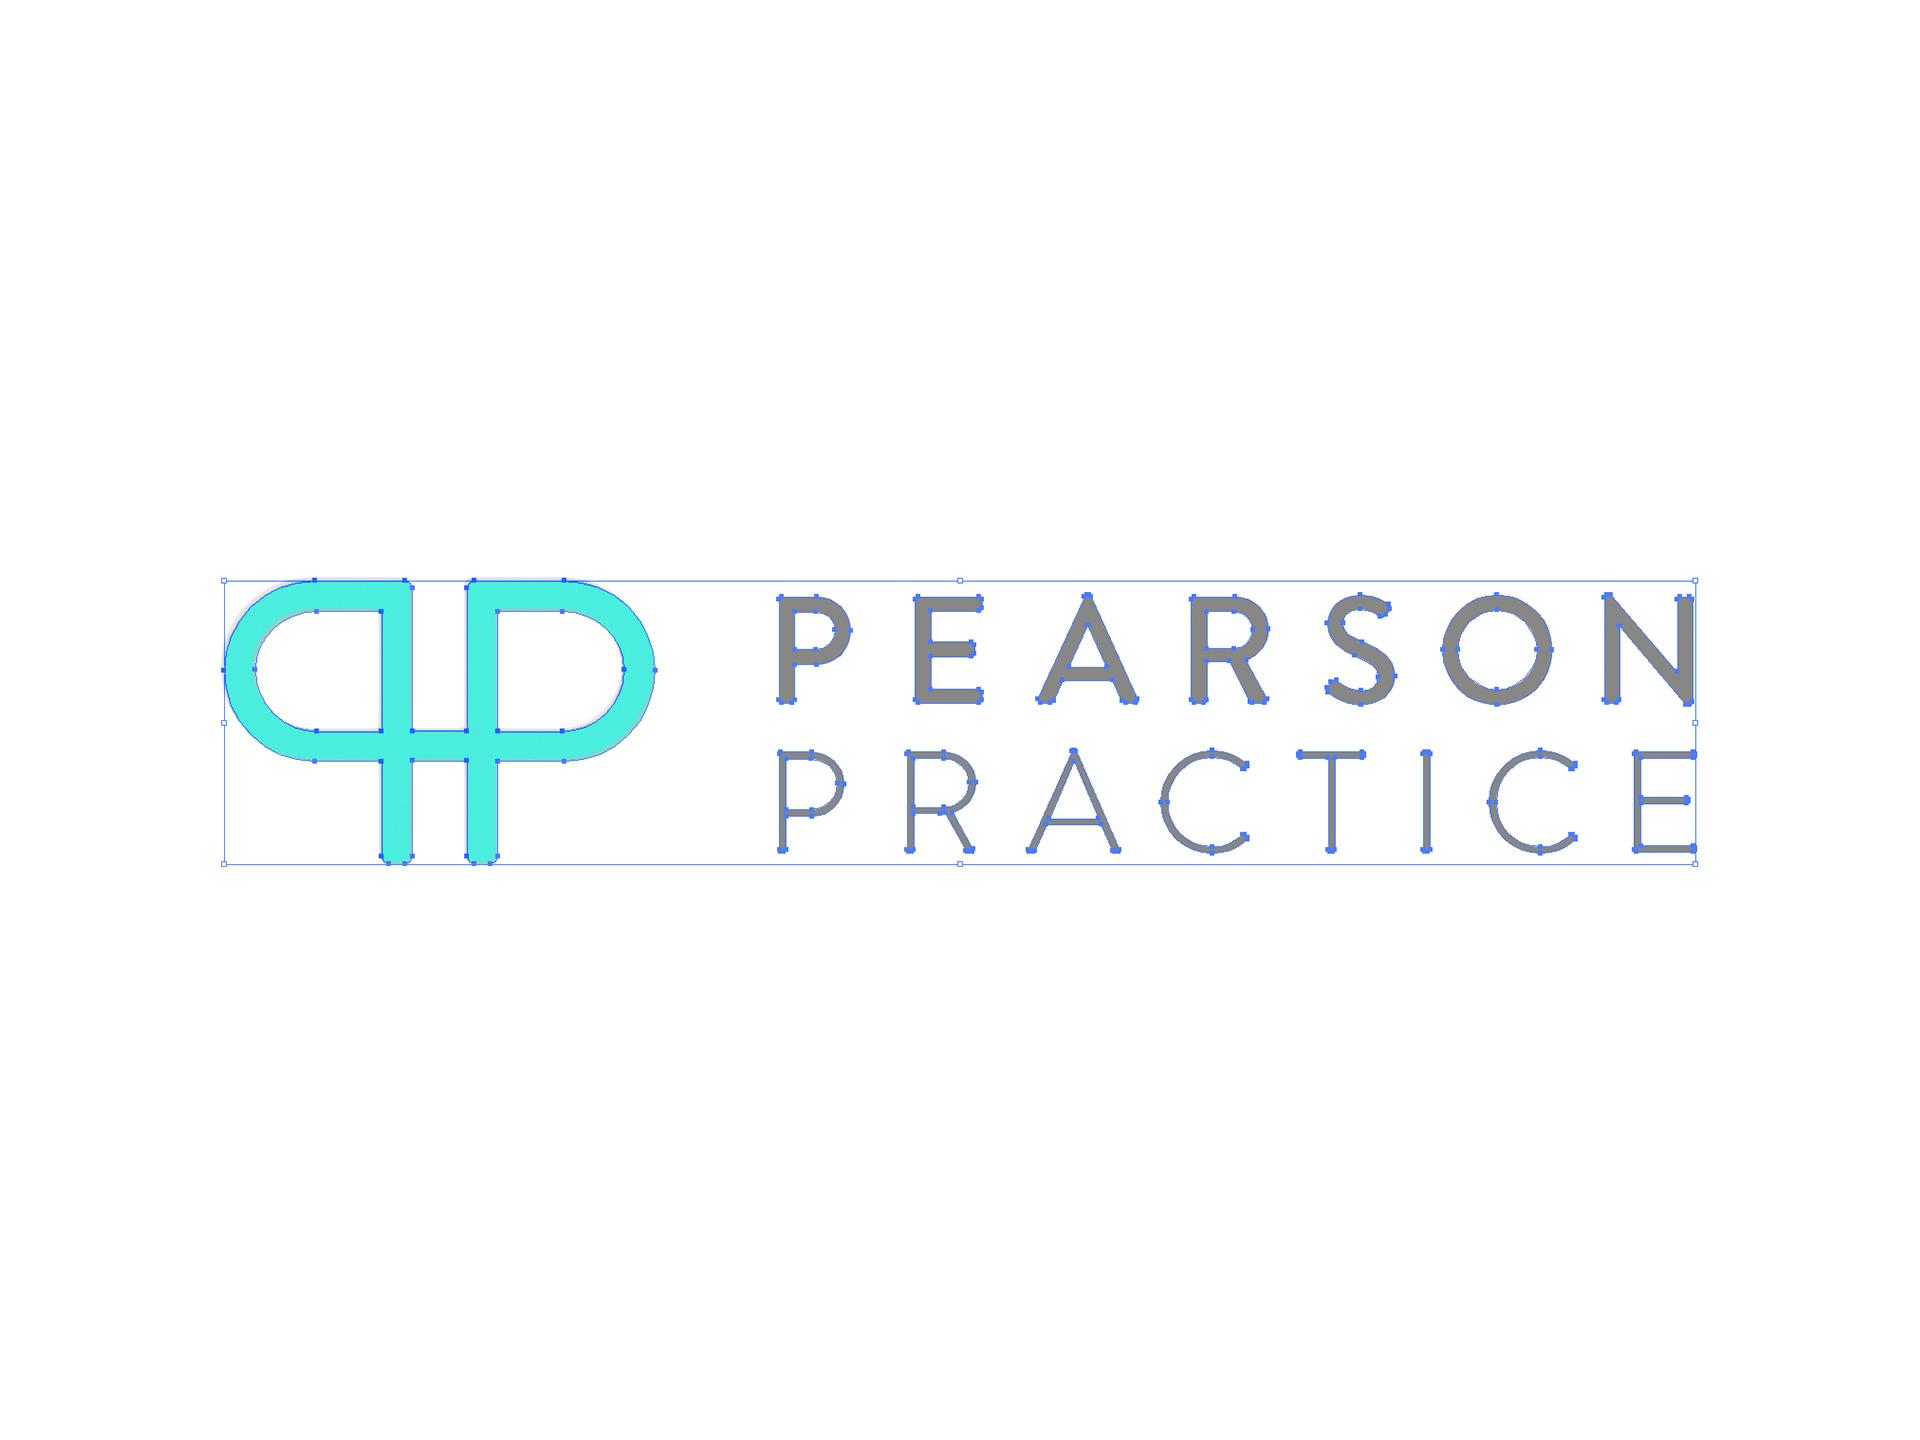 pearson dating site 2017 last week tonight with john oliver (tv series) jack pearson - economic development incentives (2017)  jack pearson 2017 devil's gate jackson pritchard.